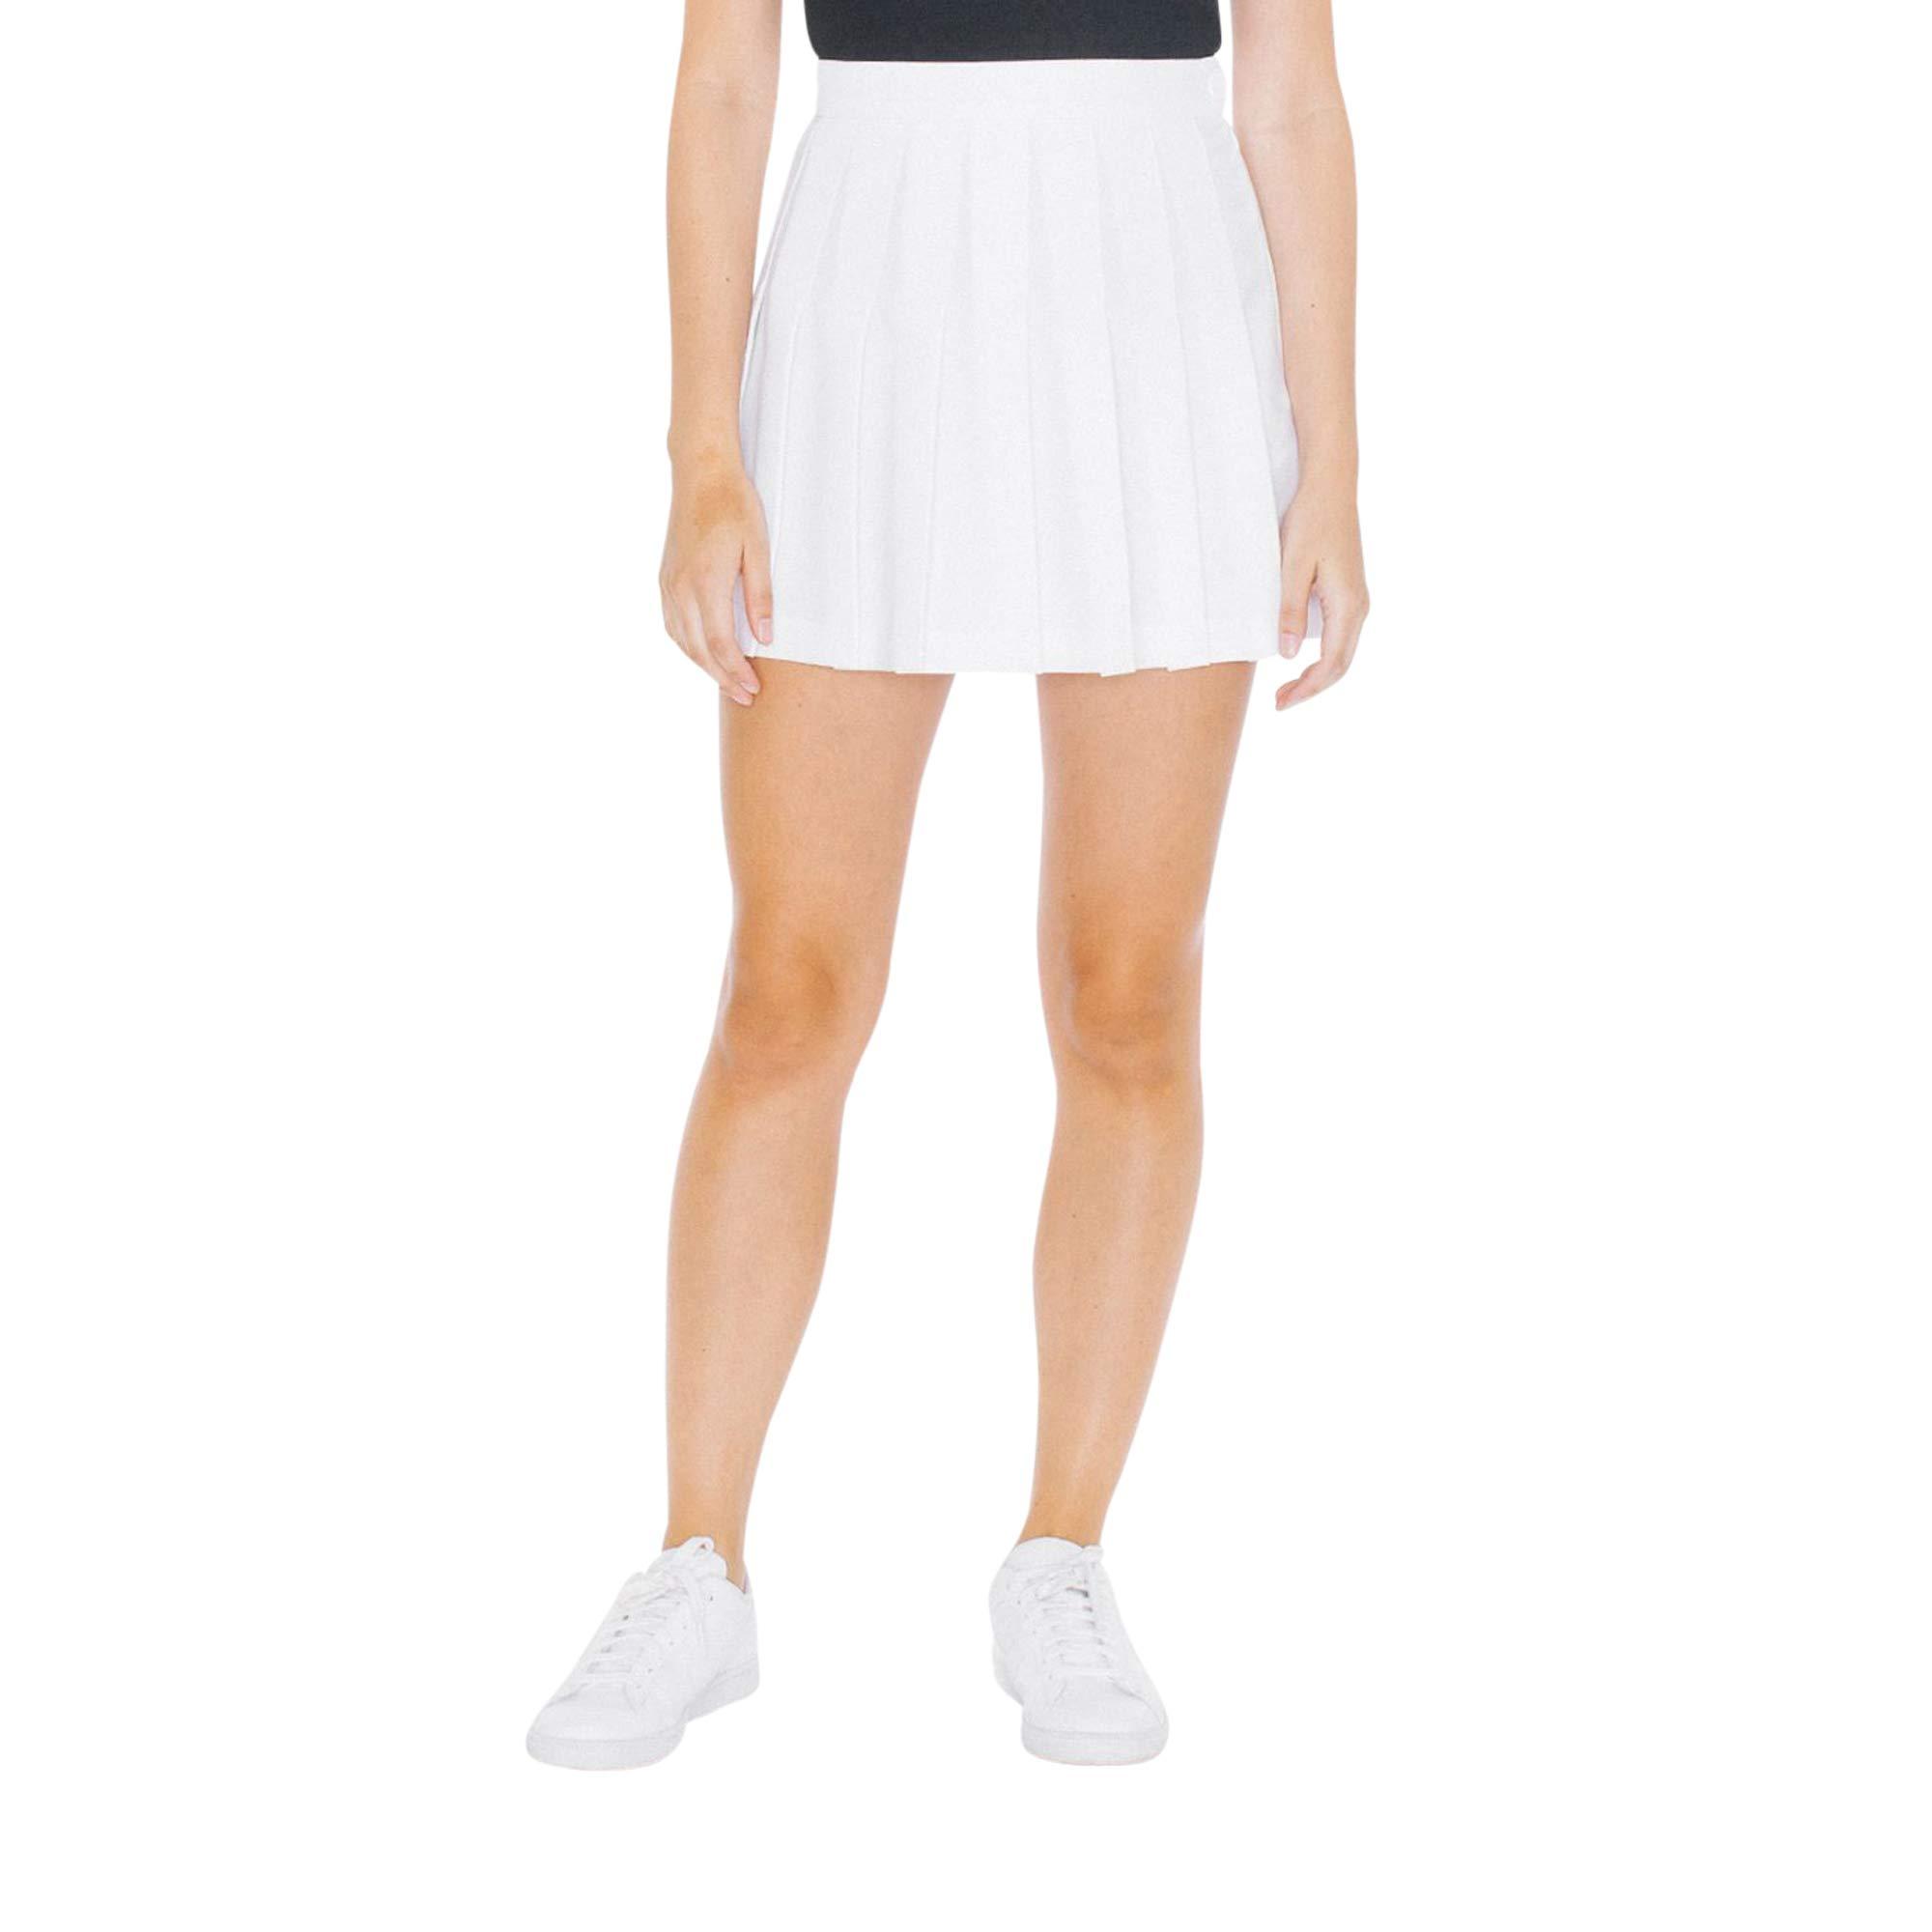 American Apparel Women's Gabardine Tennis Skirt, White, X-Small by American Apparel